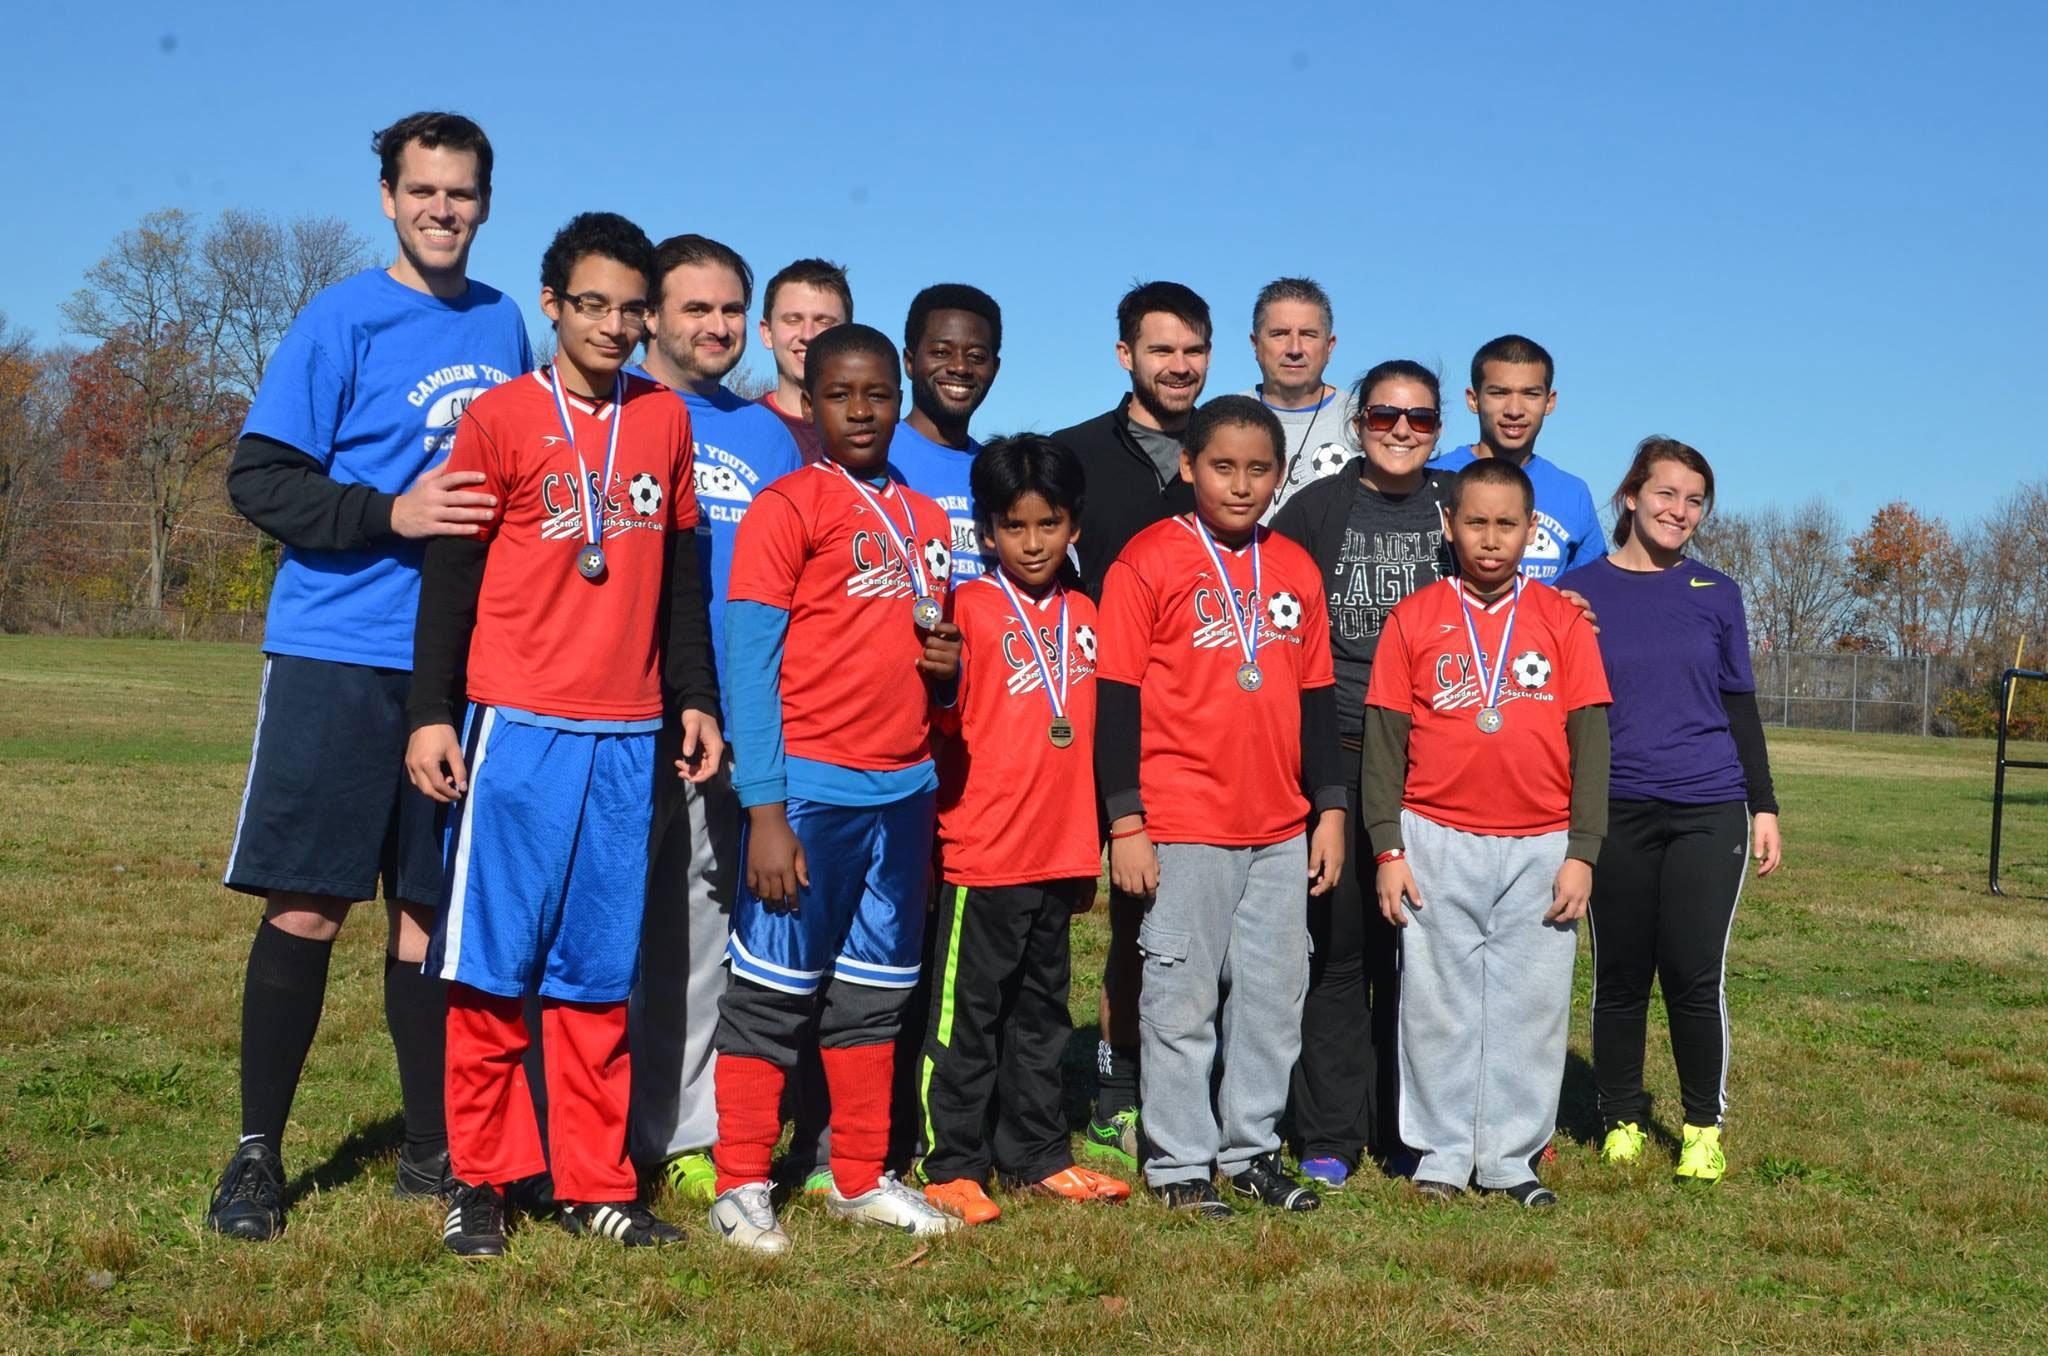 Rowan alumna Calista Condo volunteering with a youth soccer league in Camden.